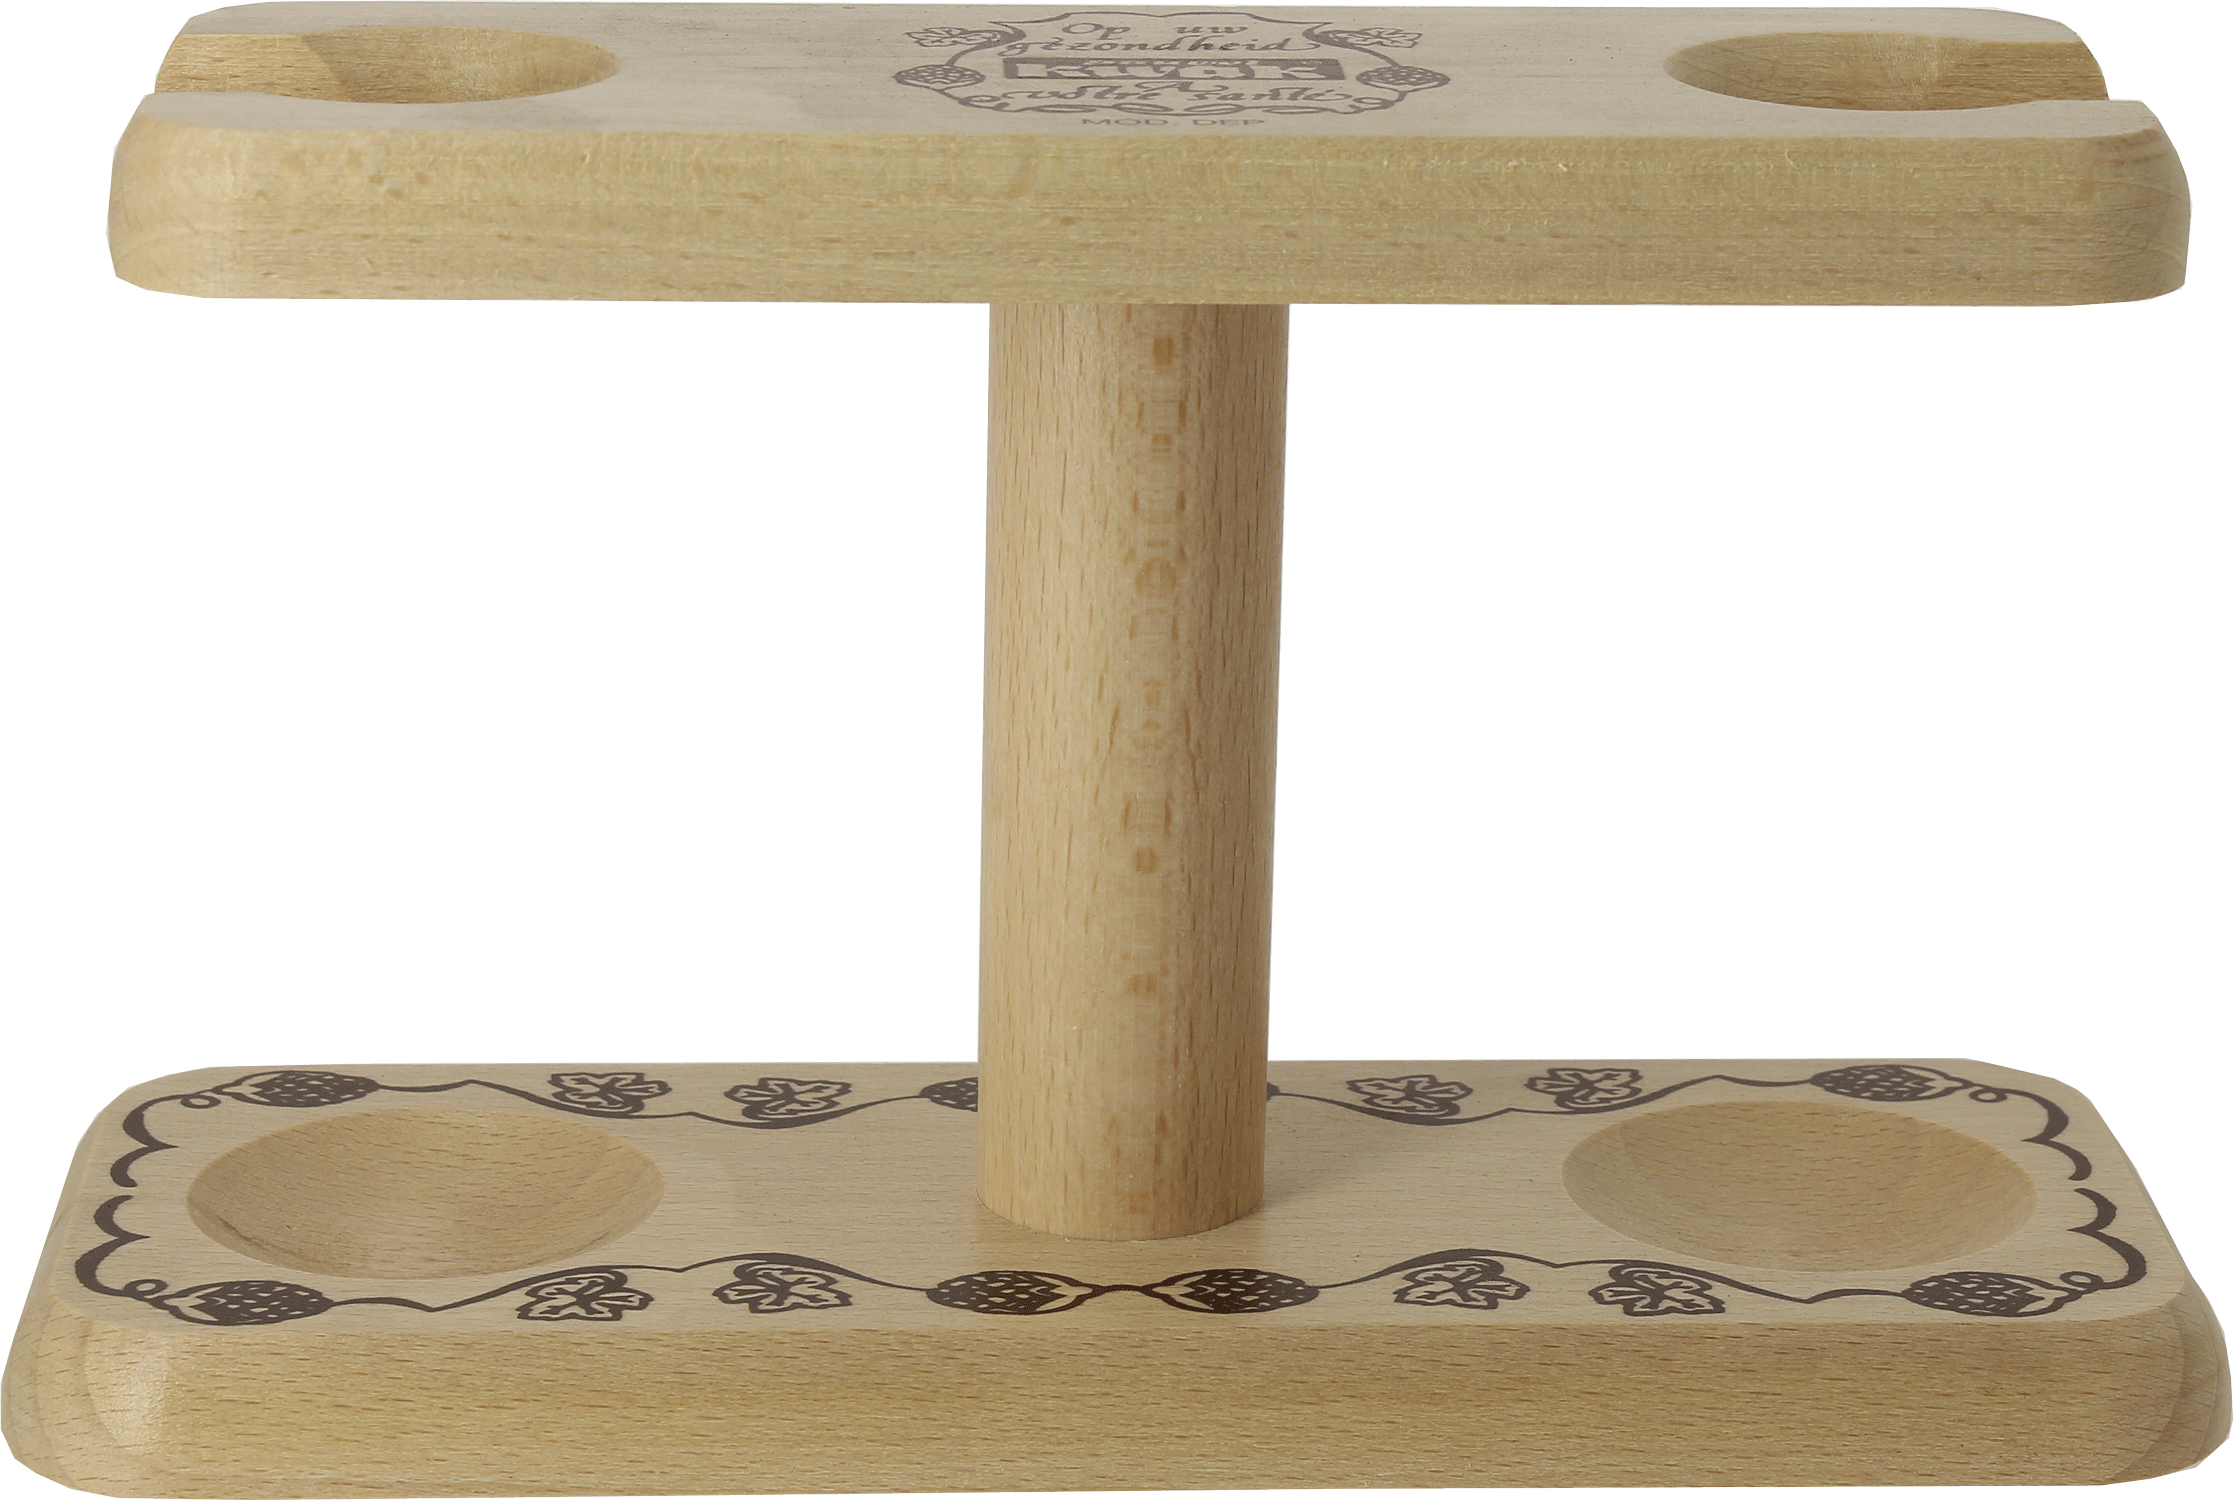 Soporte doble Kwak en madera